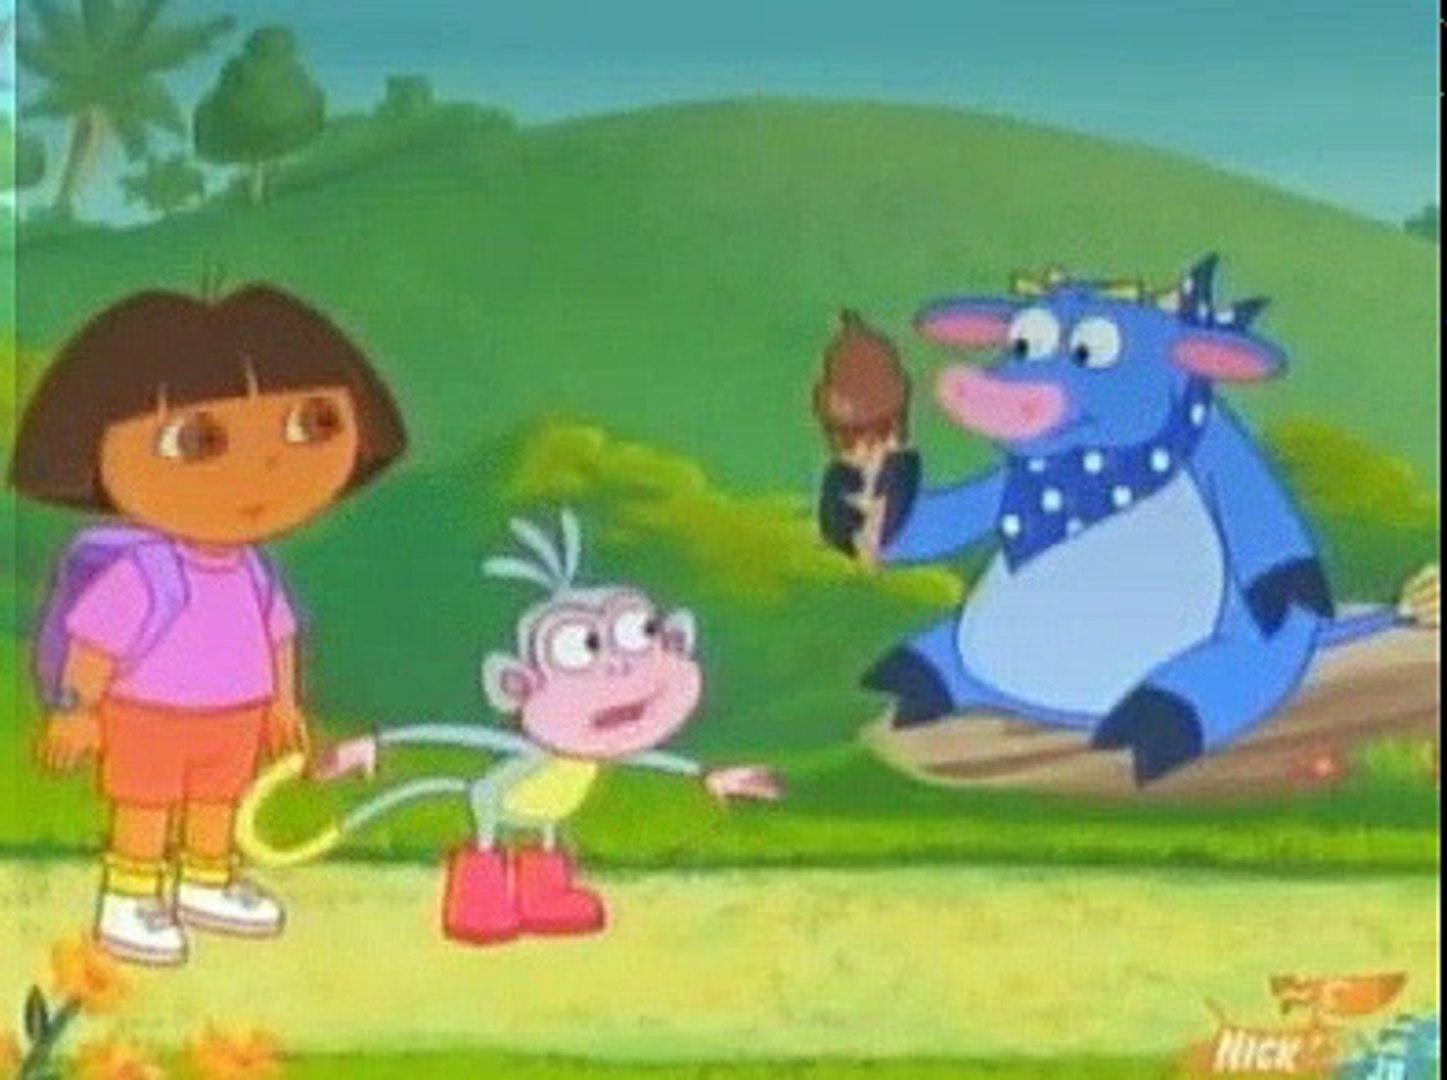 Dora the Explorer -105 - We All Scream for Ice Cream